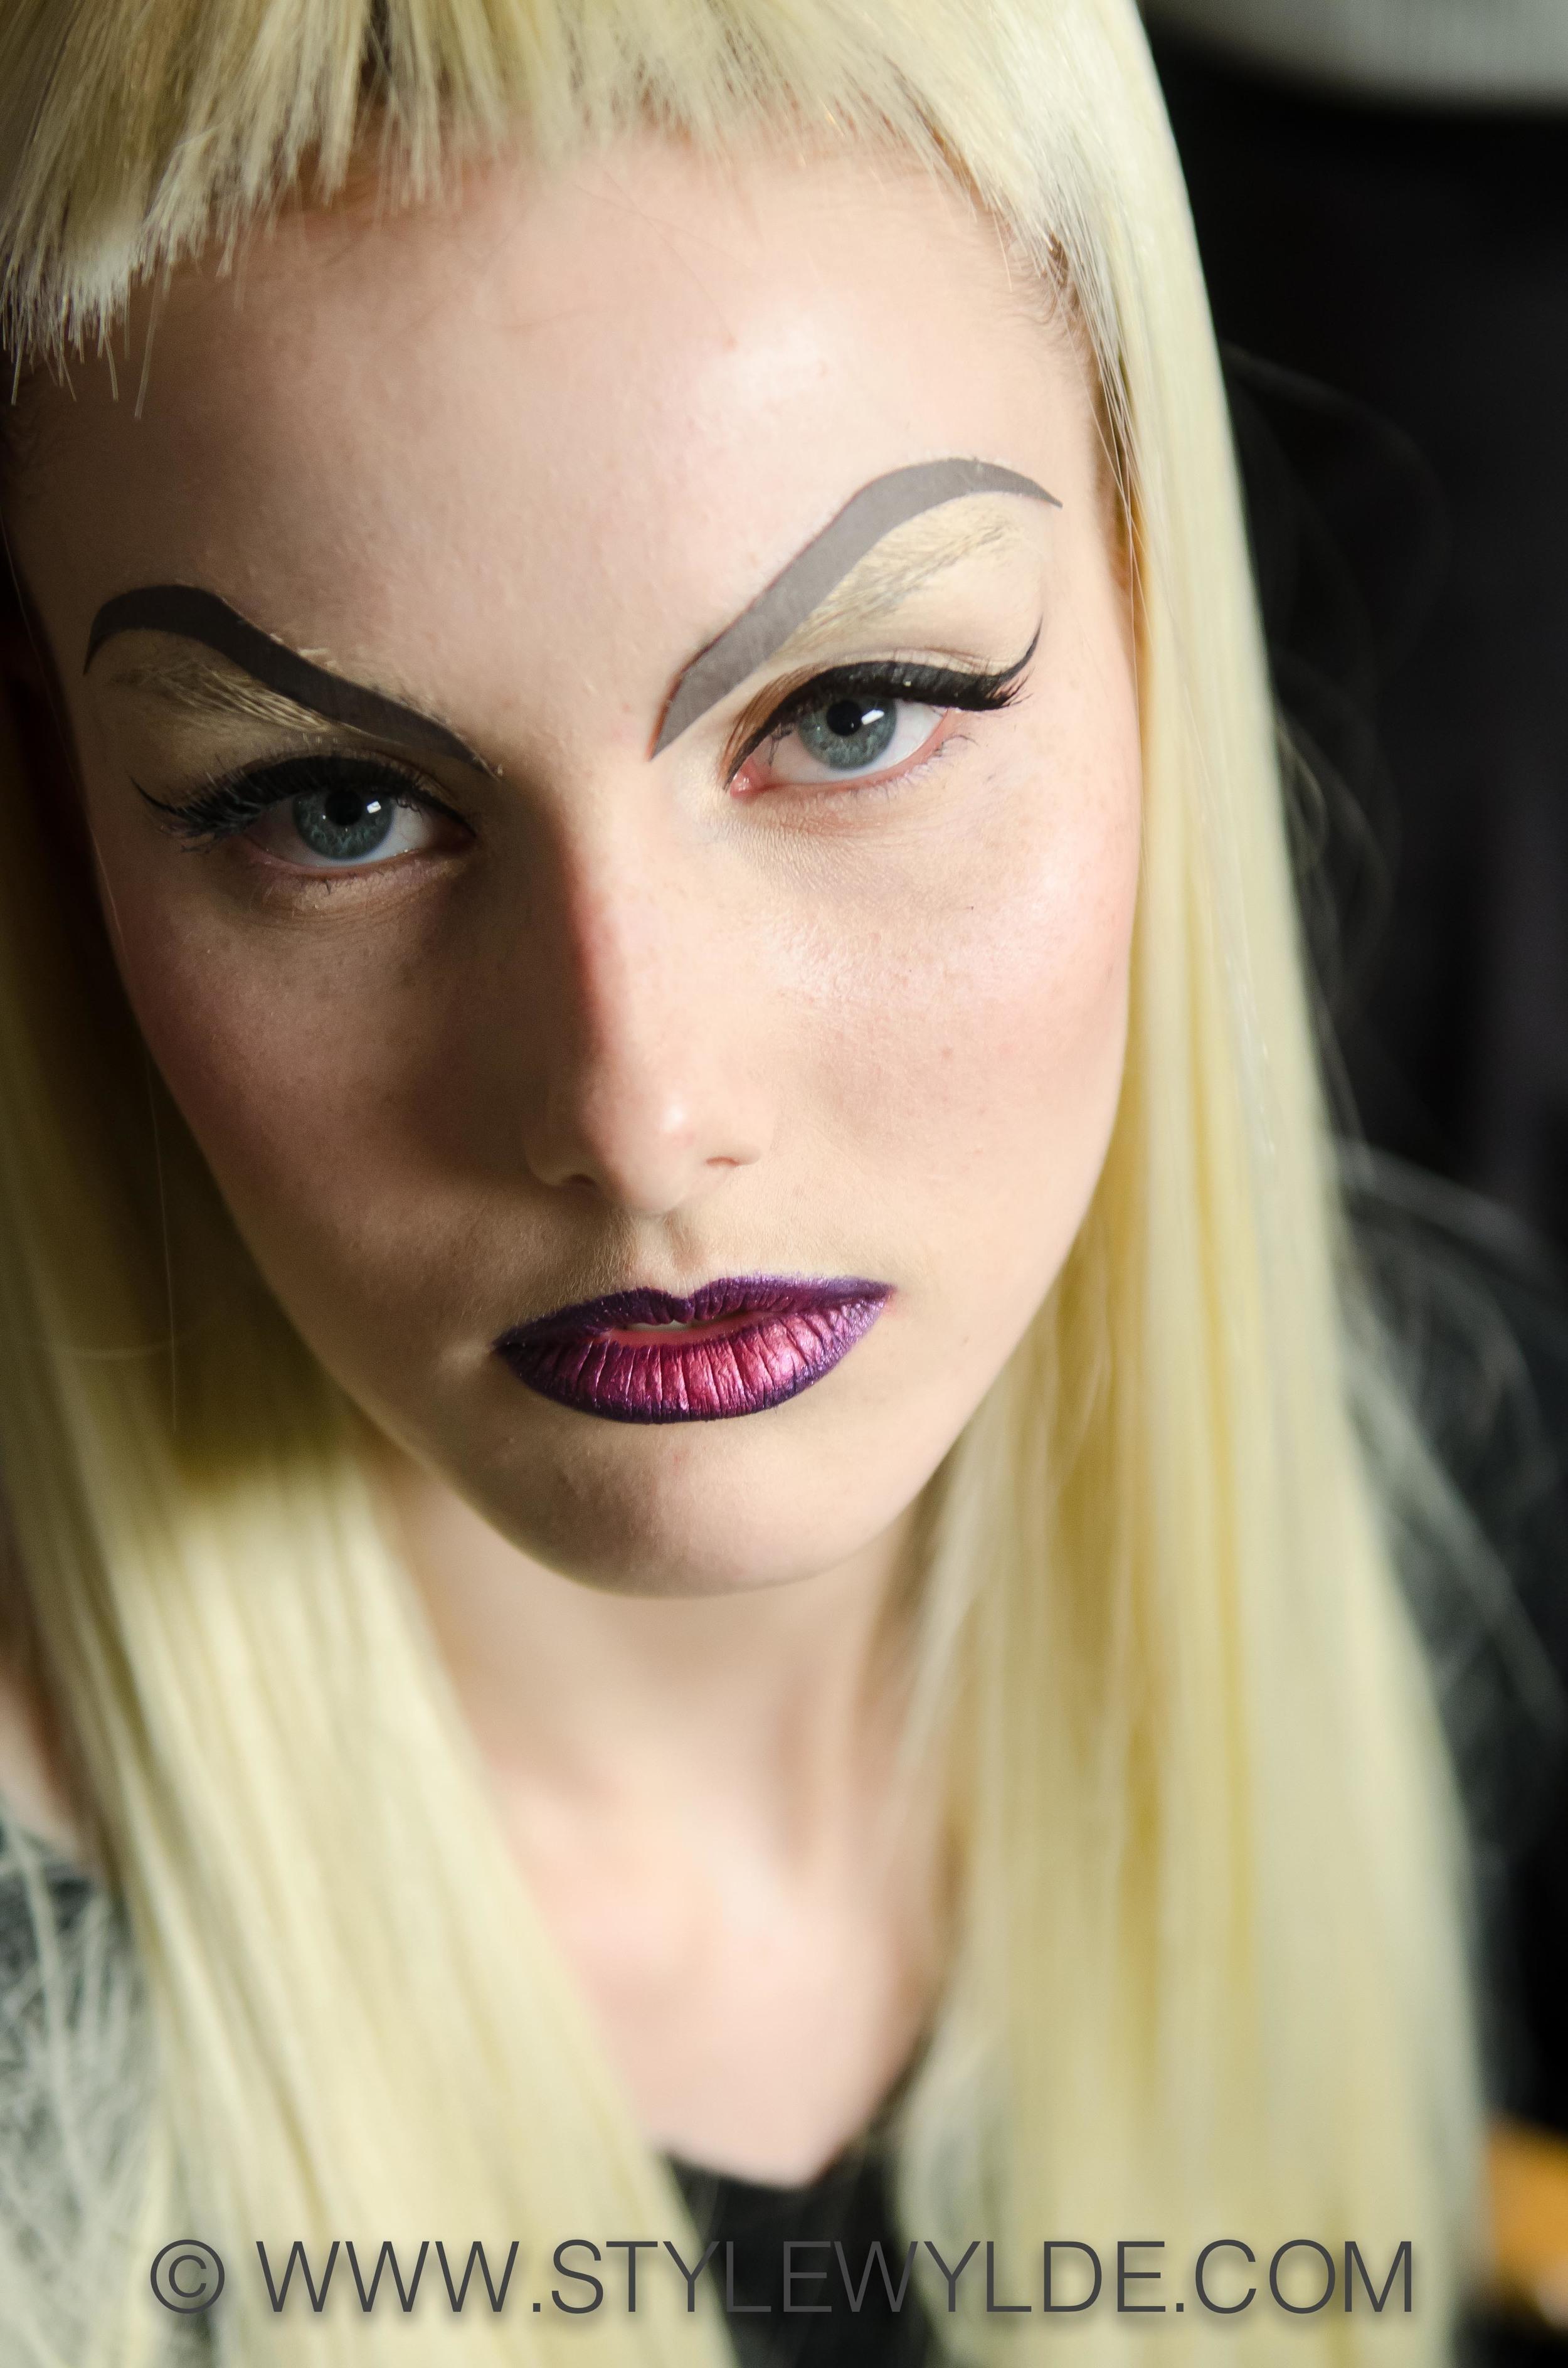 Stylewylde_Blonds_FW2014_BKSTG_CA 1 of 1.jpg